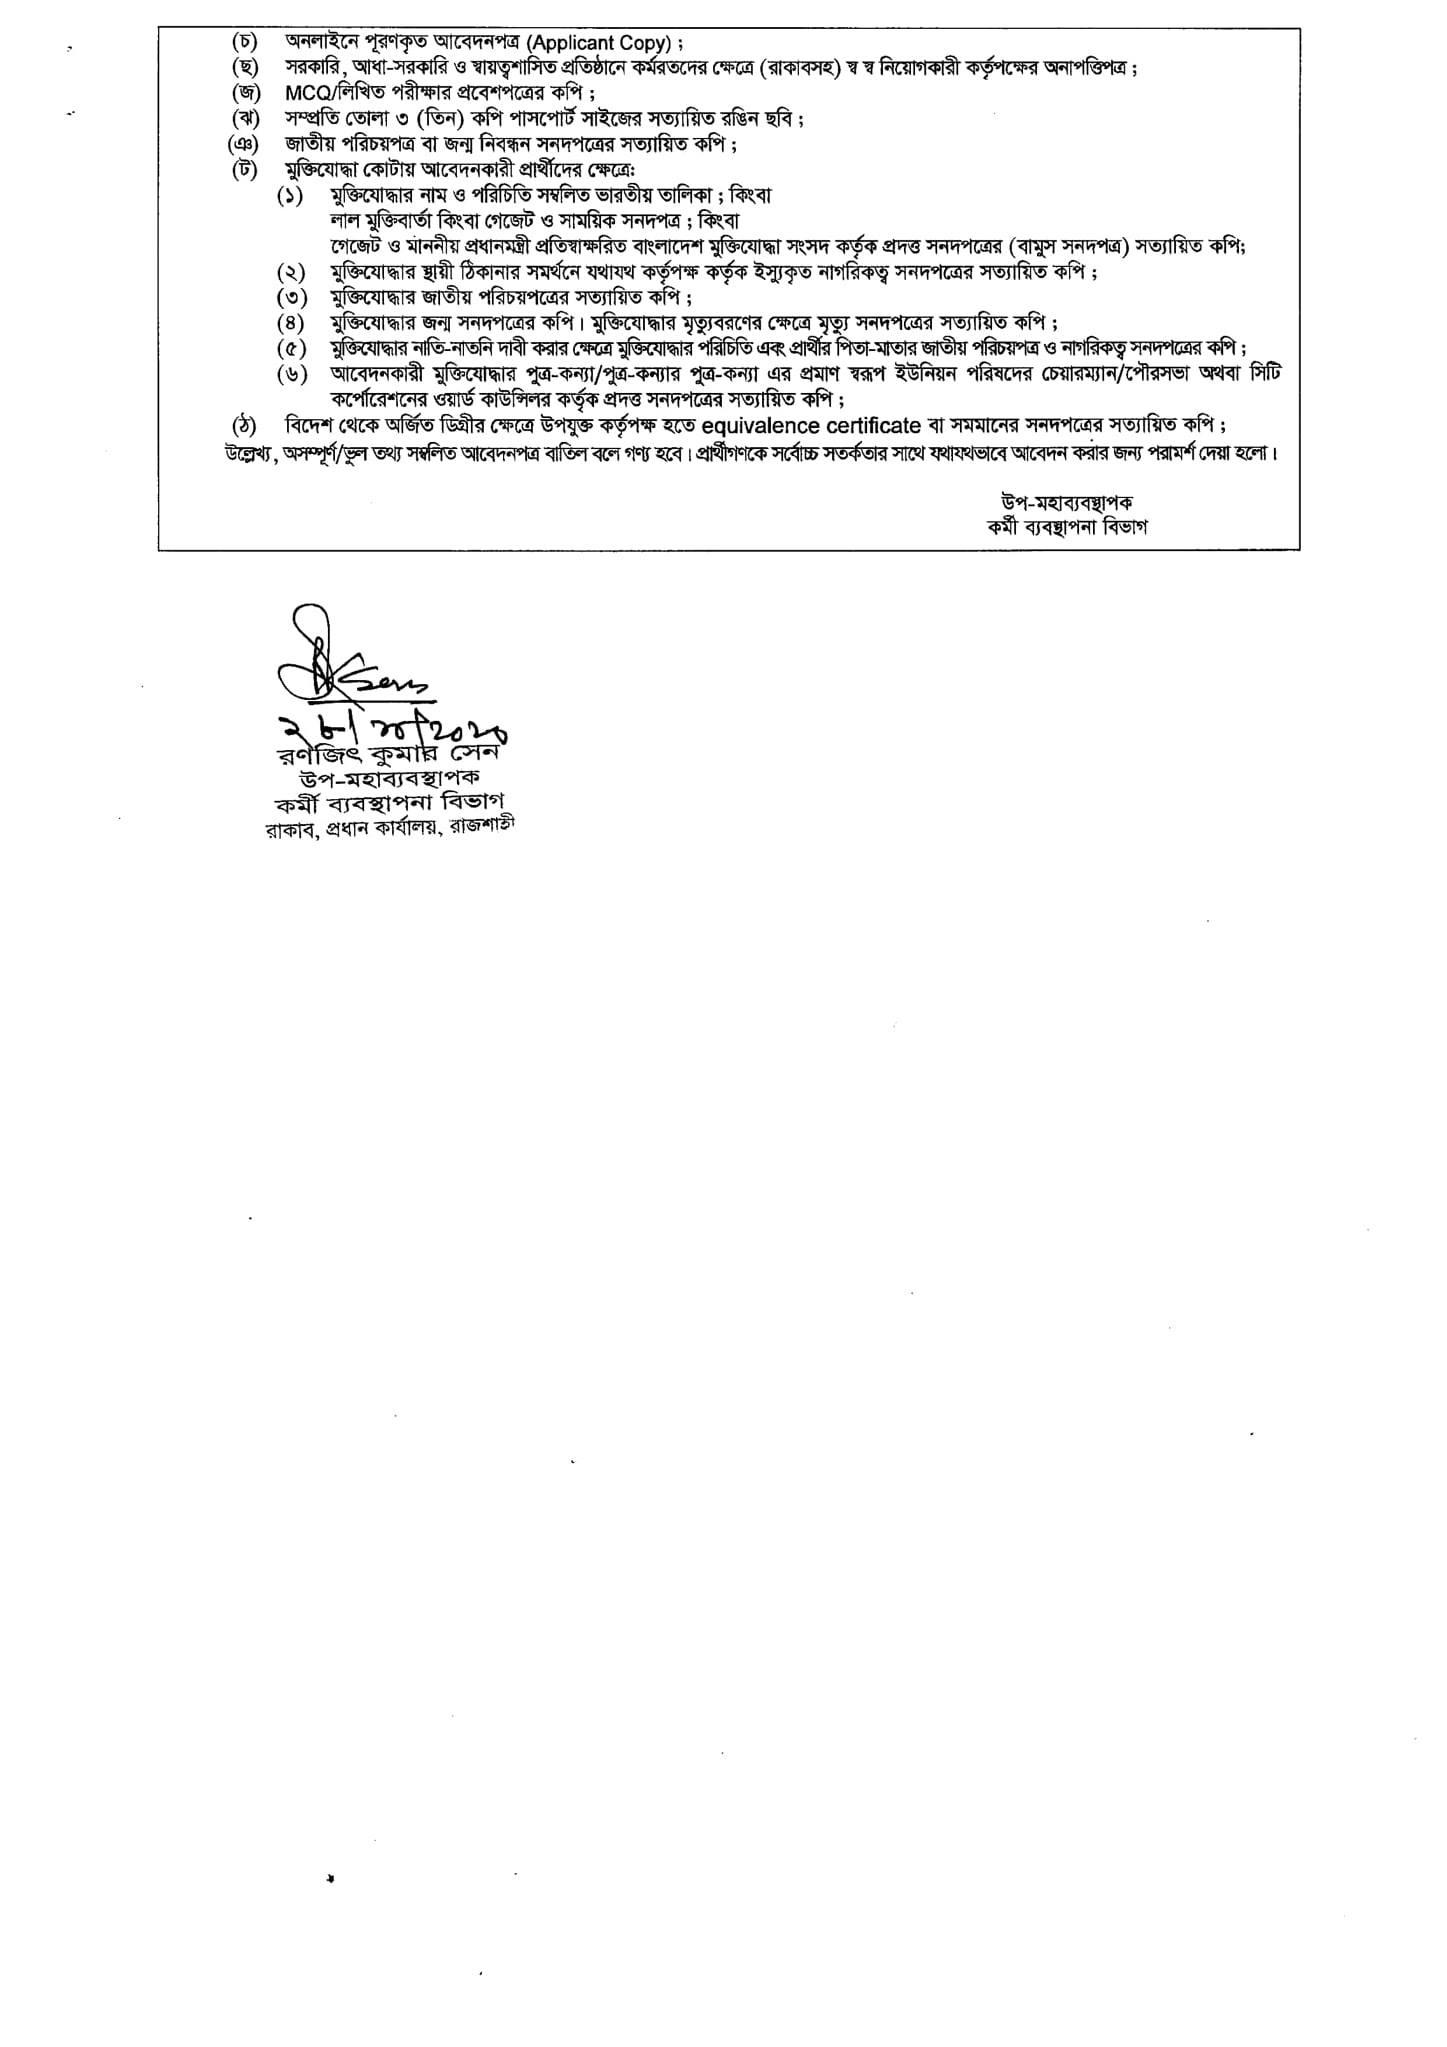 Rajshahi-Krishi-Unnayan-Bank-job-circular-2020-learninghomebd-03